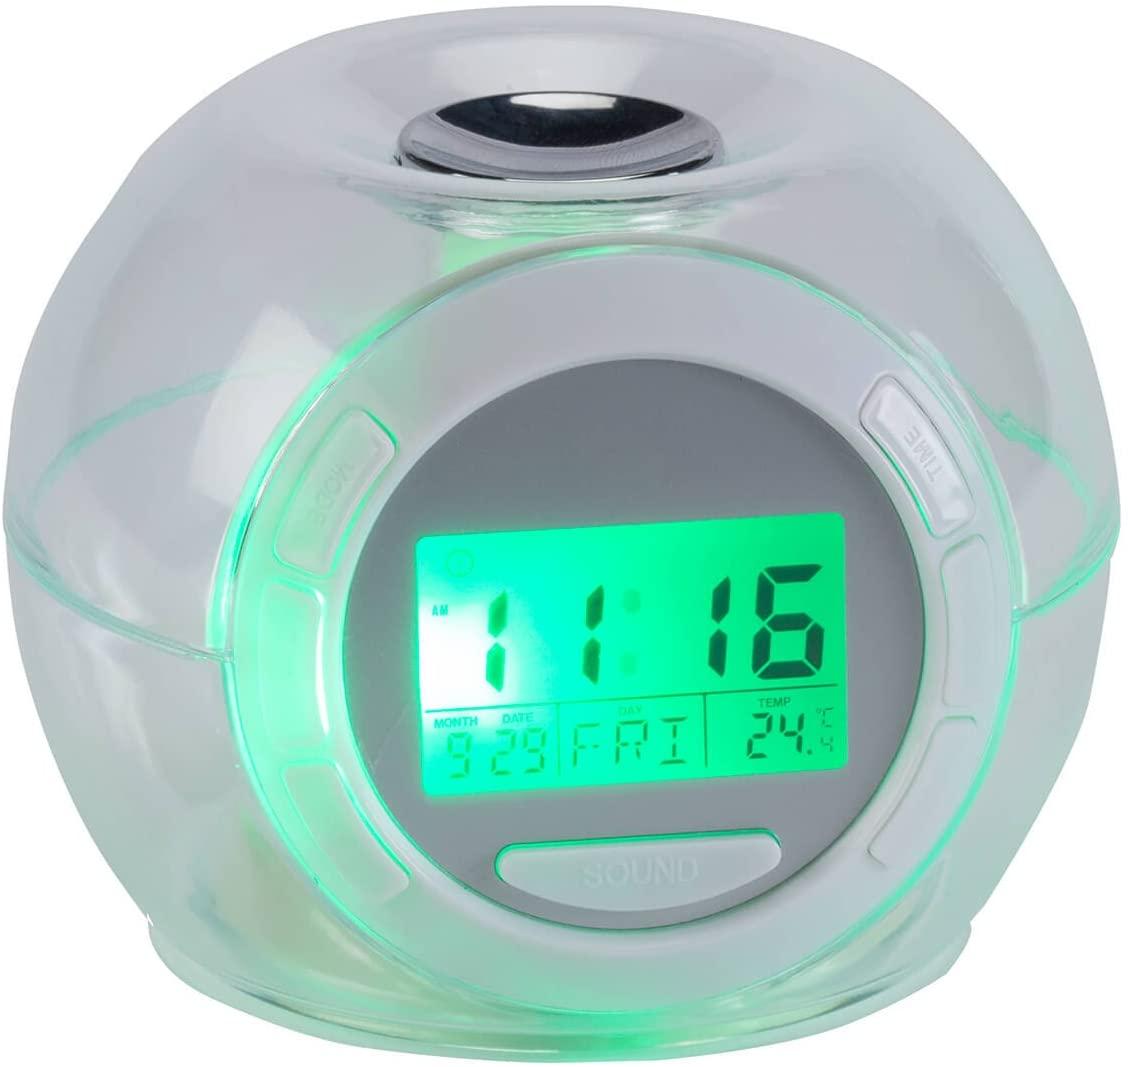 Fox Valley Traders Sleep Machine - Soothing Sounds & Alarm Clock